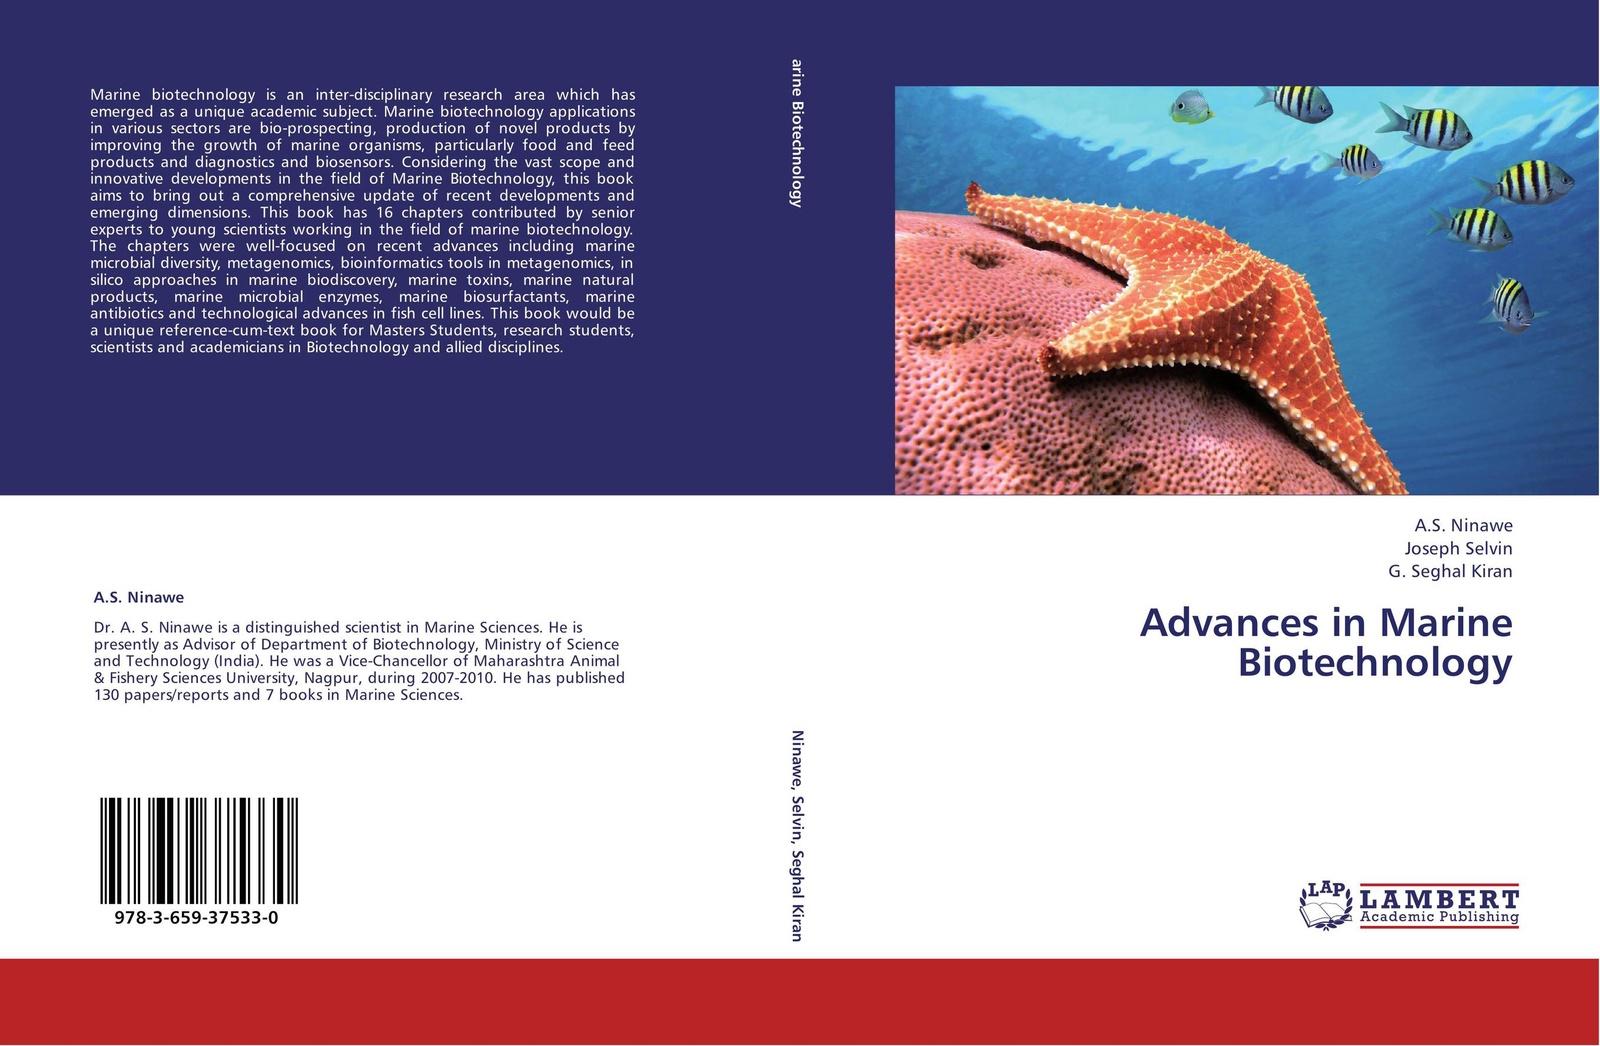 A.S. Ninawe,Joseph Selvin and G. Seghal Kiran Advances in Marine Biotechnology